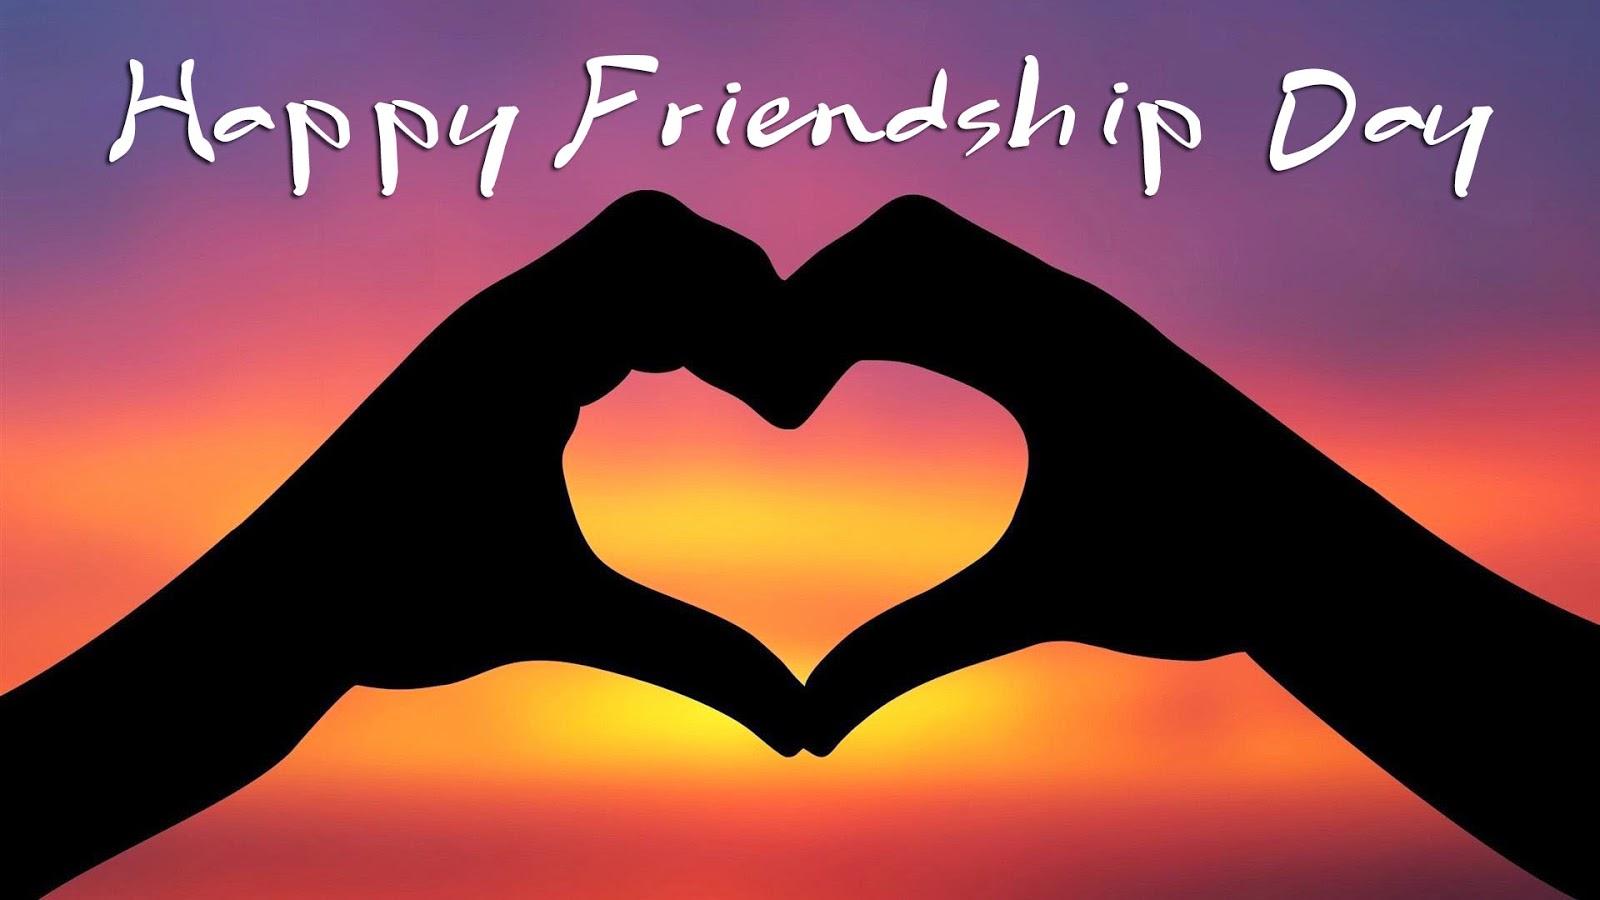 Happy Friendship Day Heart Of Hands Wallpaper